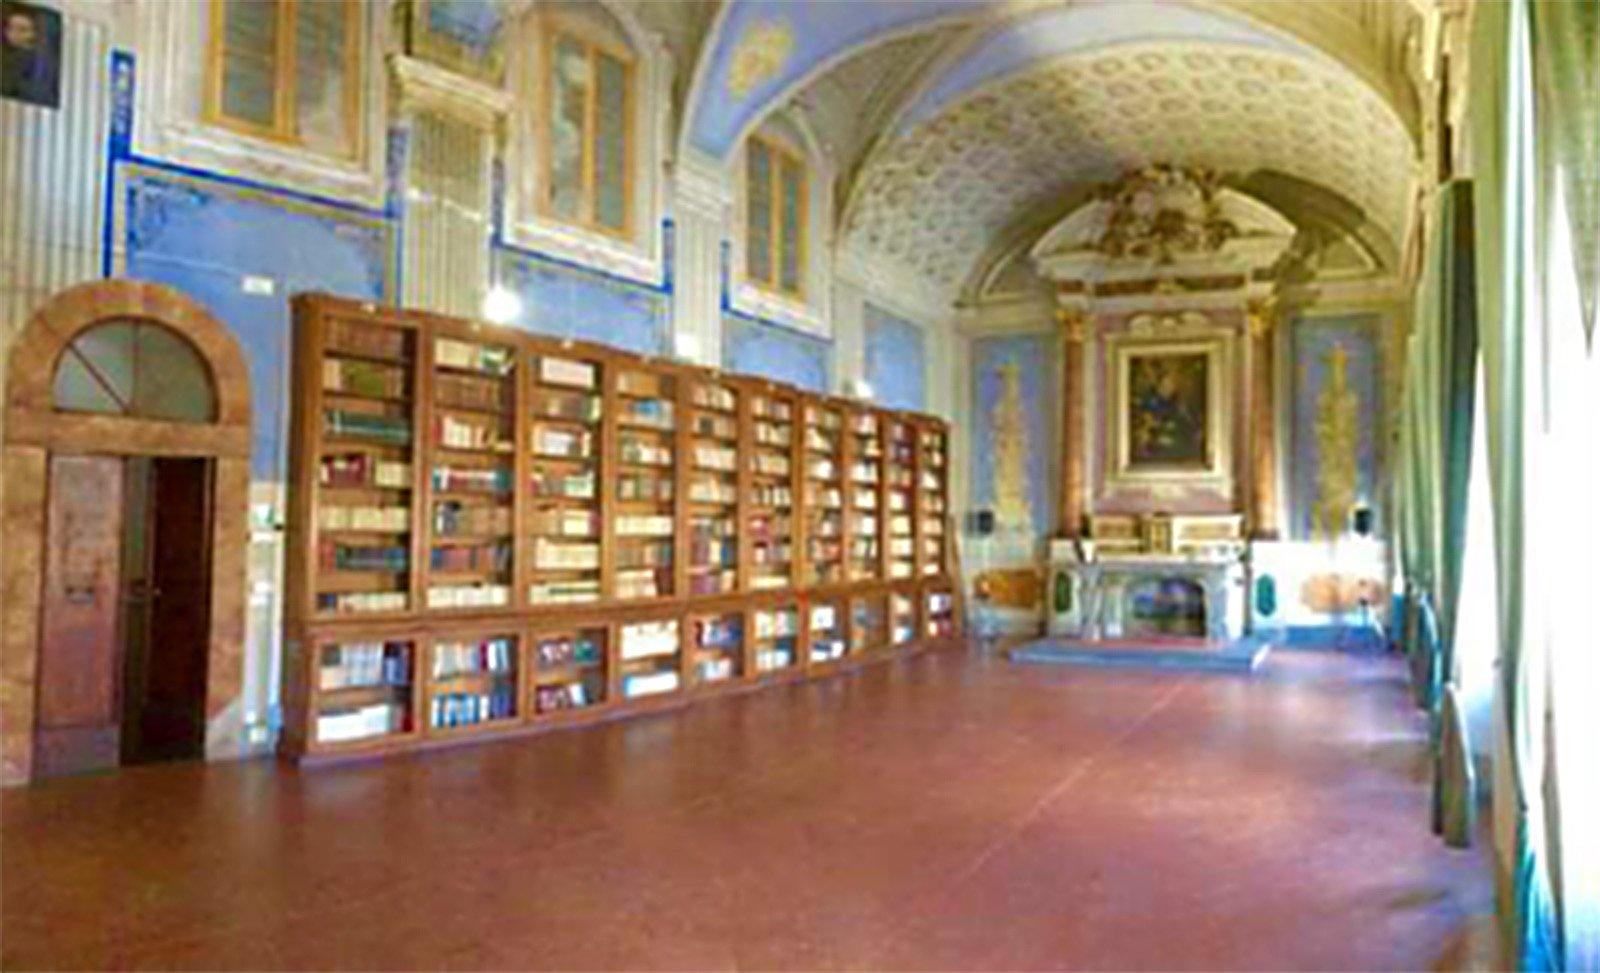 biblioteca orbassano san luigi rome - photo#13